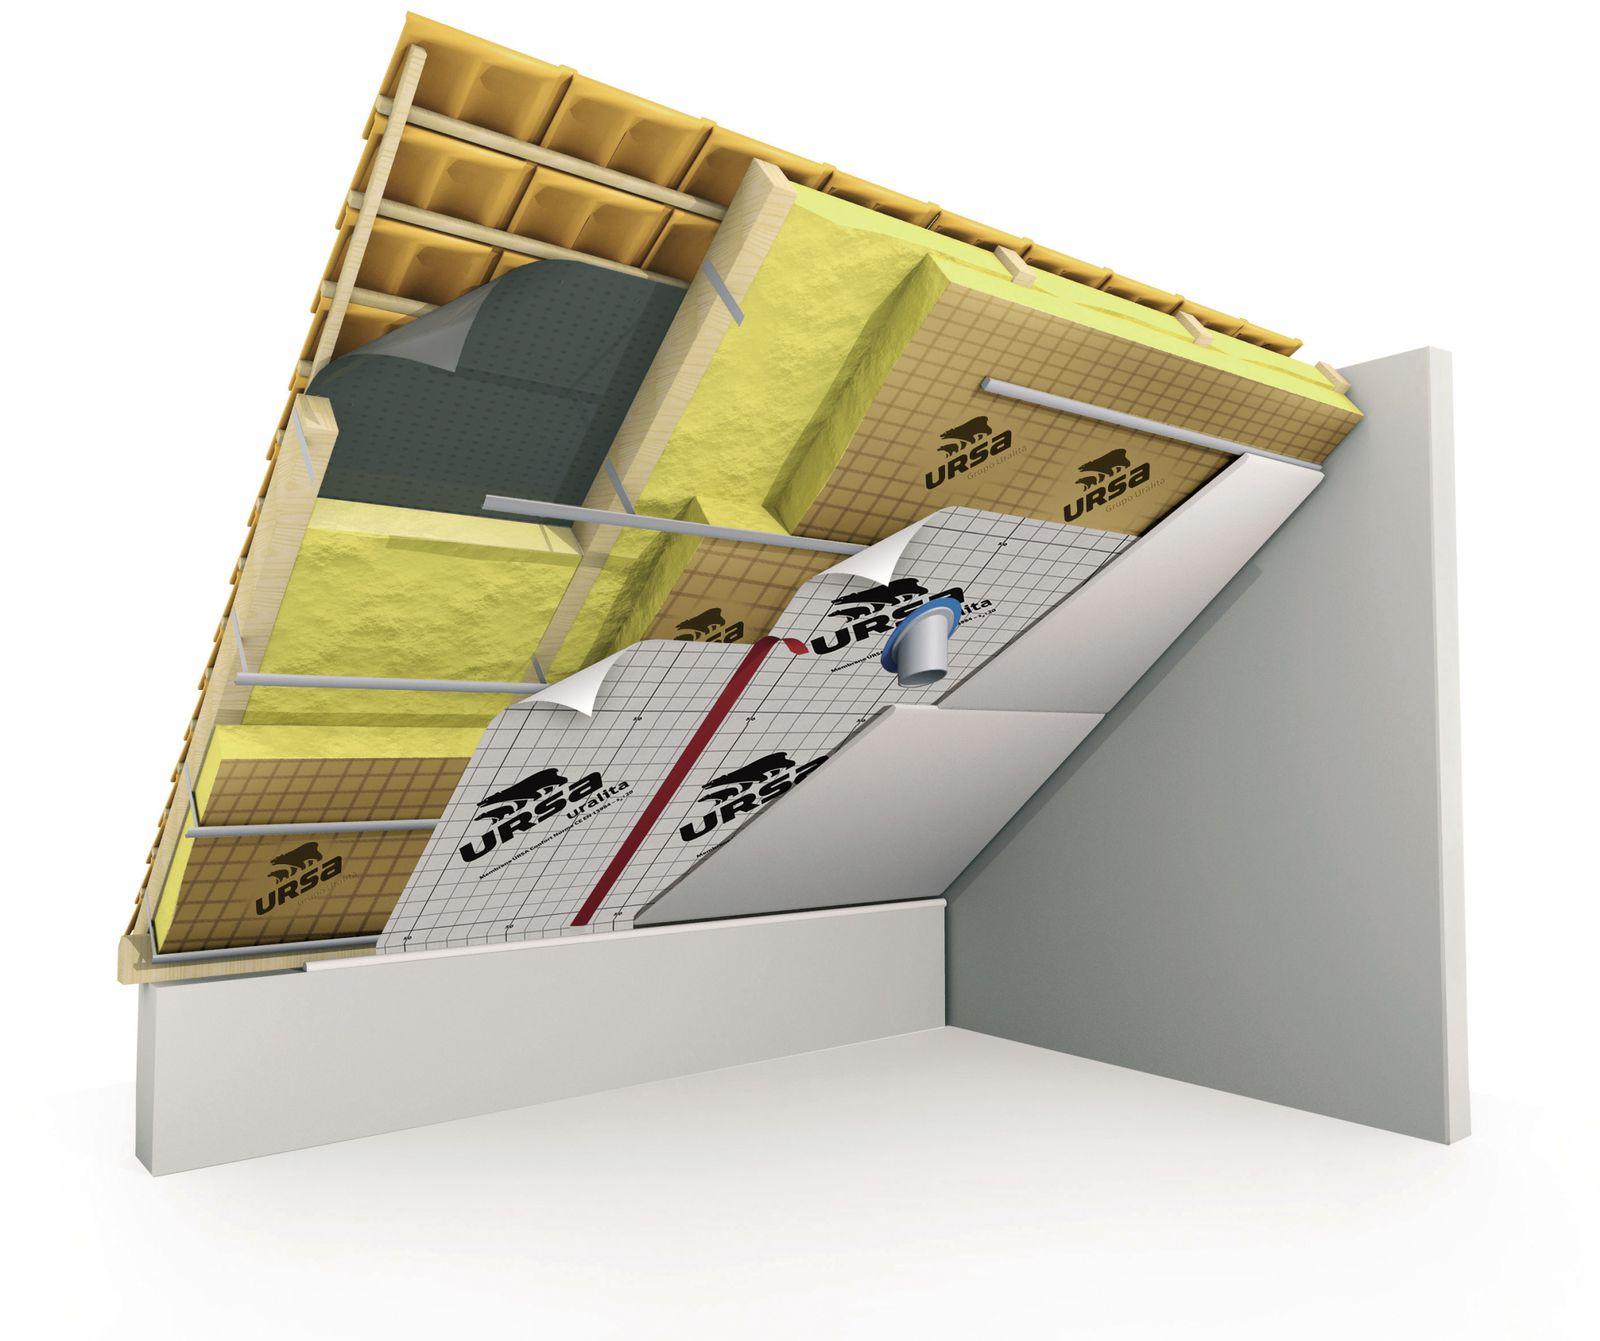 plancher comble leroy merlin id e. Black Bedroom Furniture Sets. Home Design Ideas